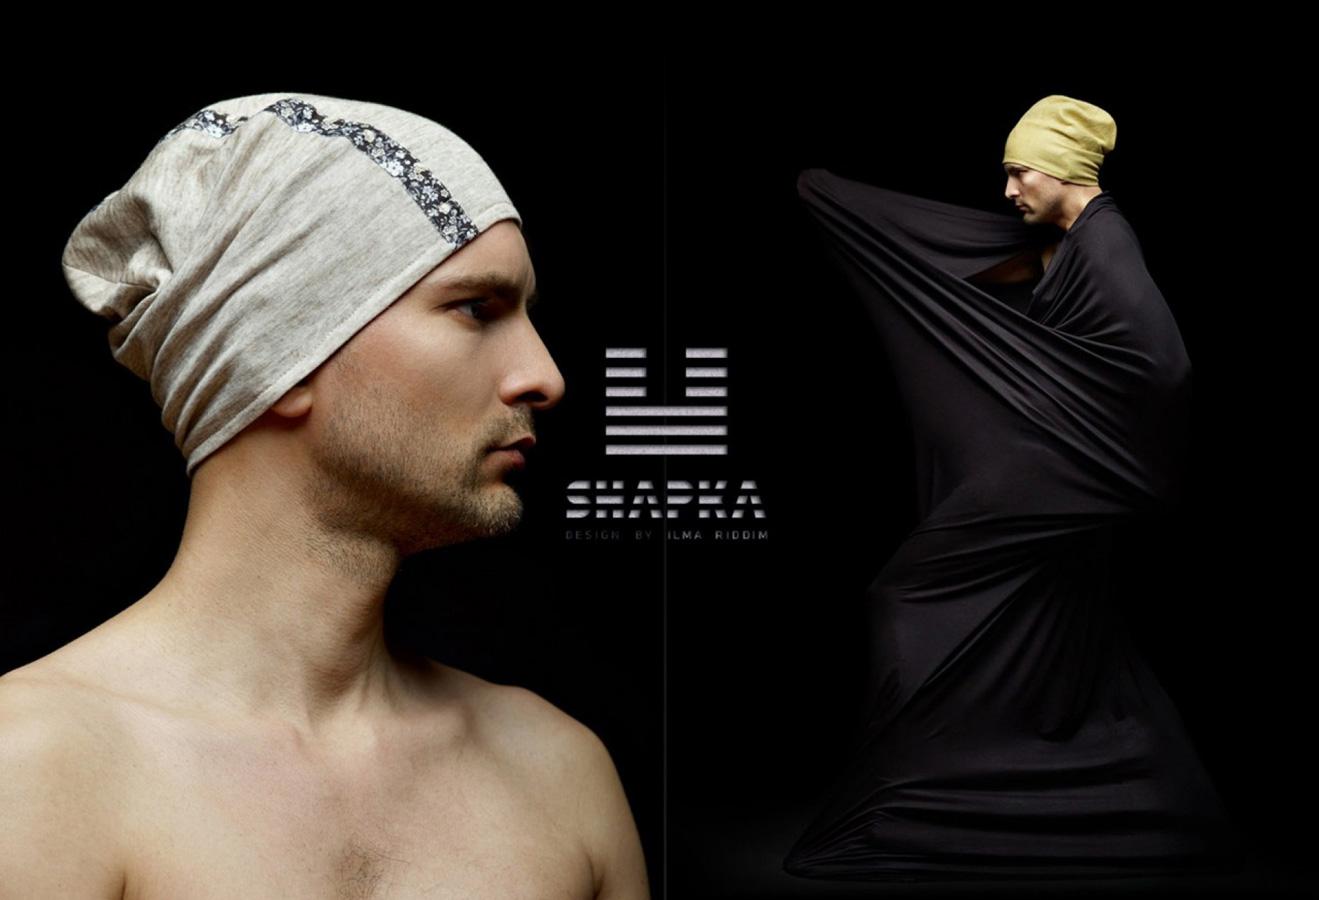 Shapka promo для Ilma Riddim. Рекламная фотосъемка, фотограф Лена Волкова